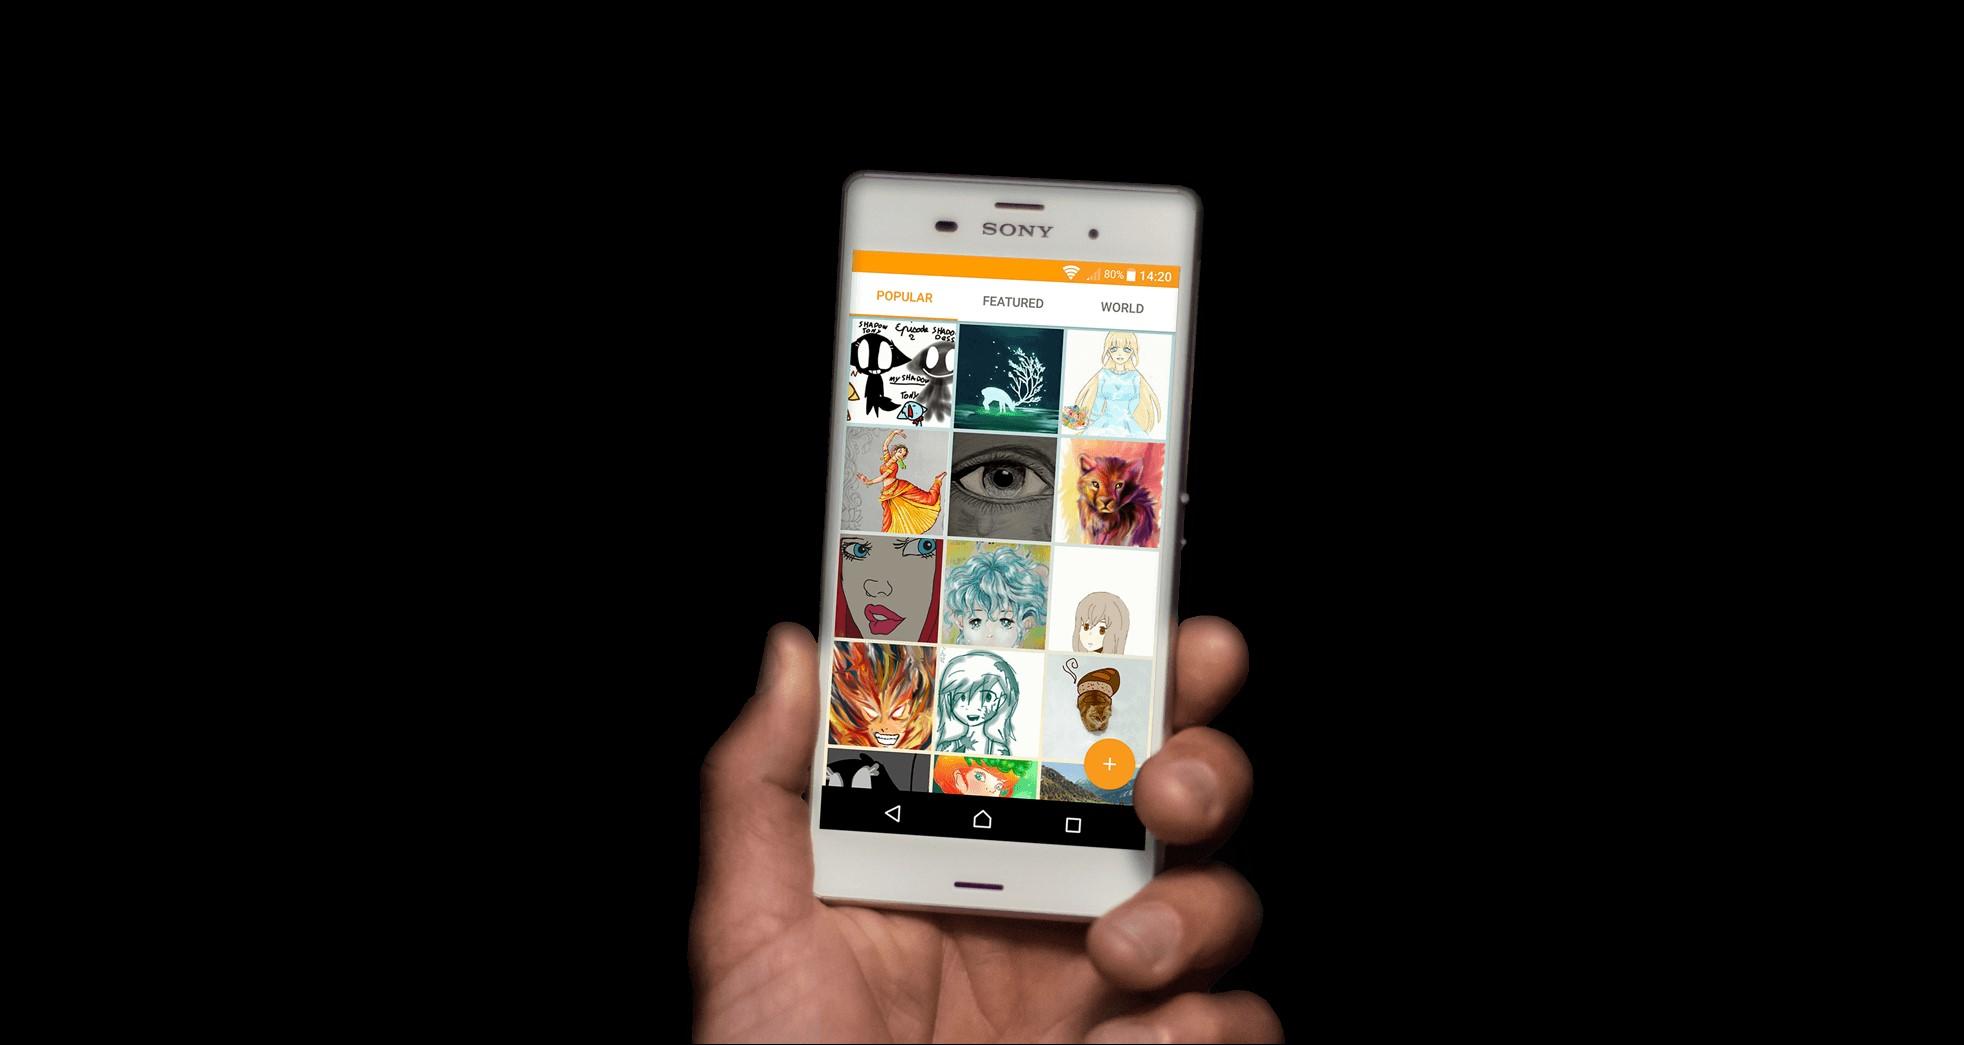 Sony omezí aplikaci Náčrt pro Android a iOS